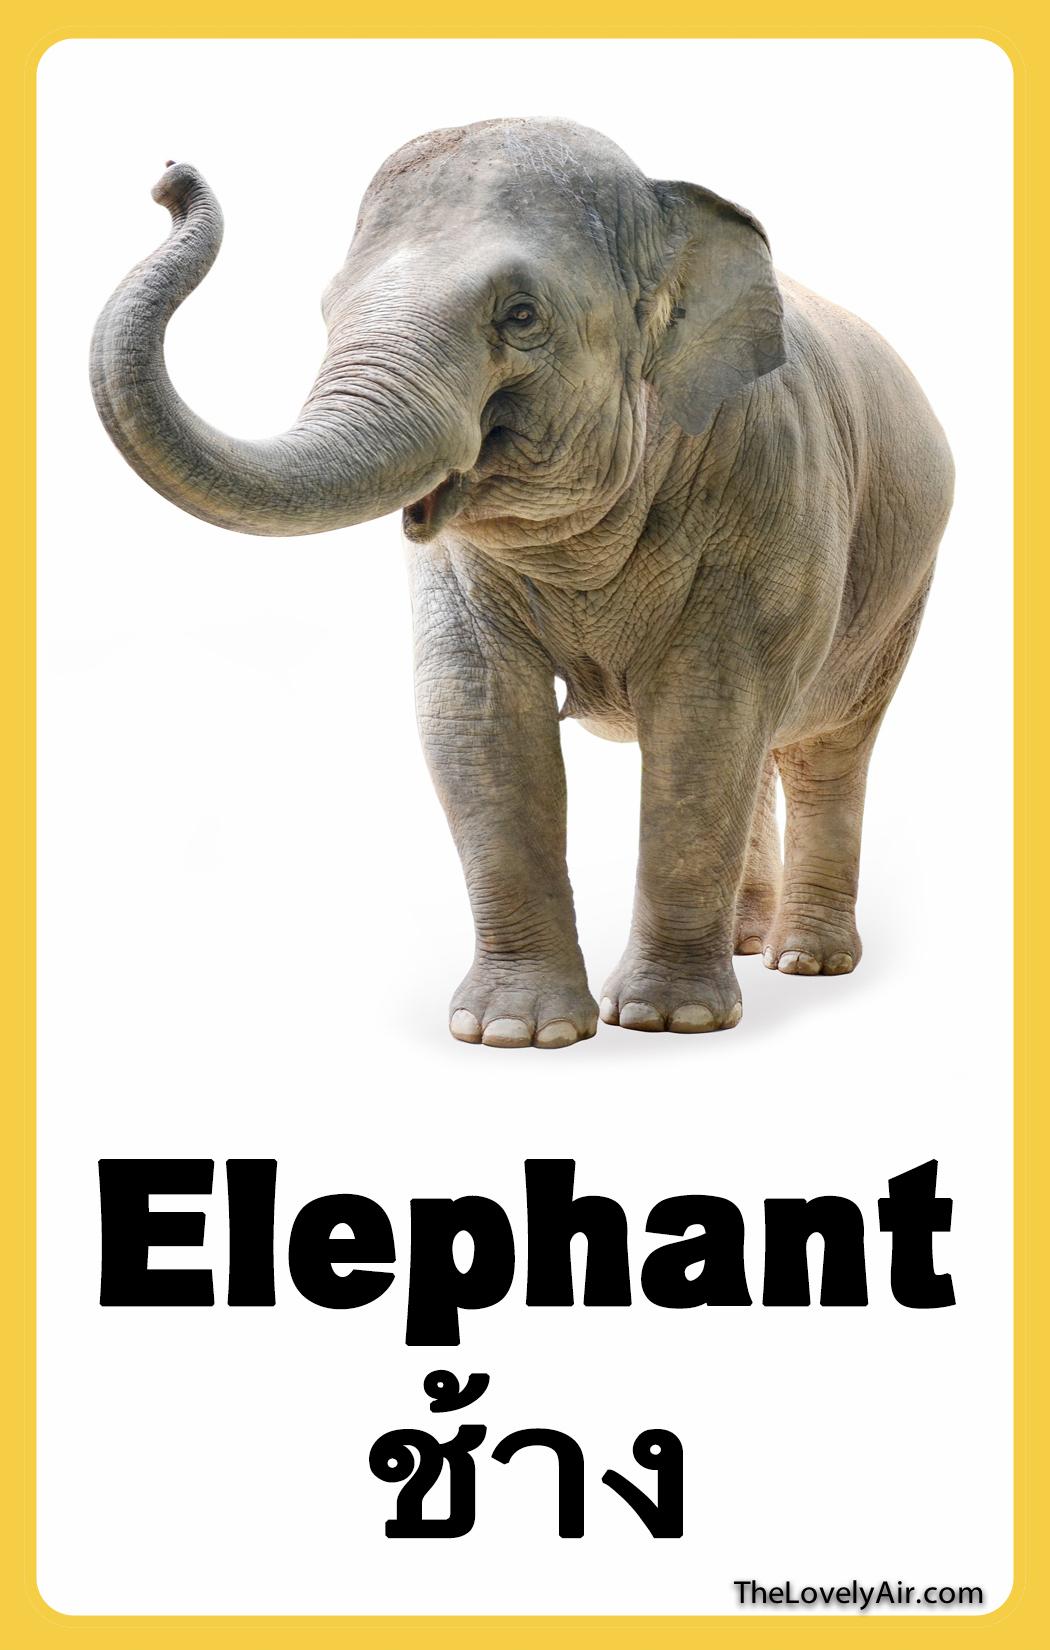 FlashCard - Elephant